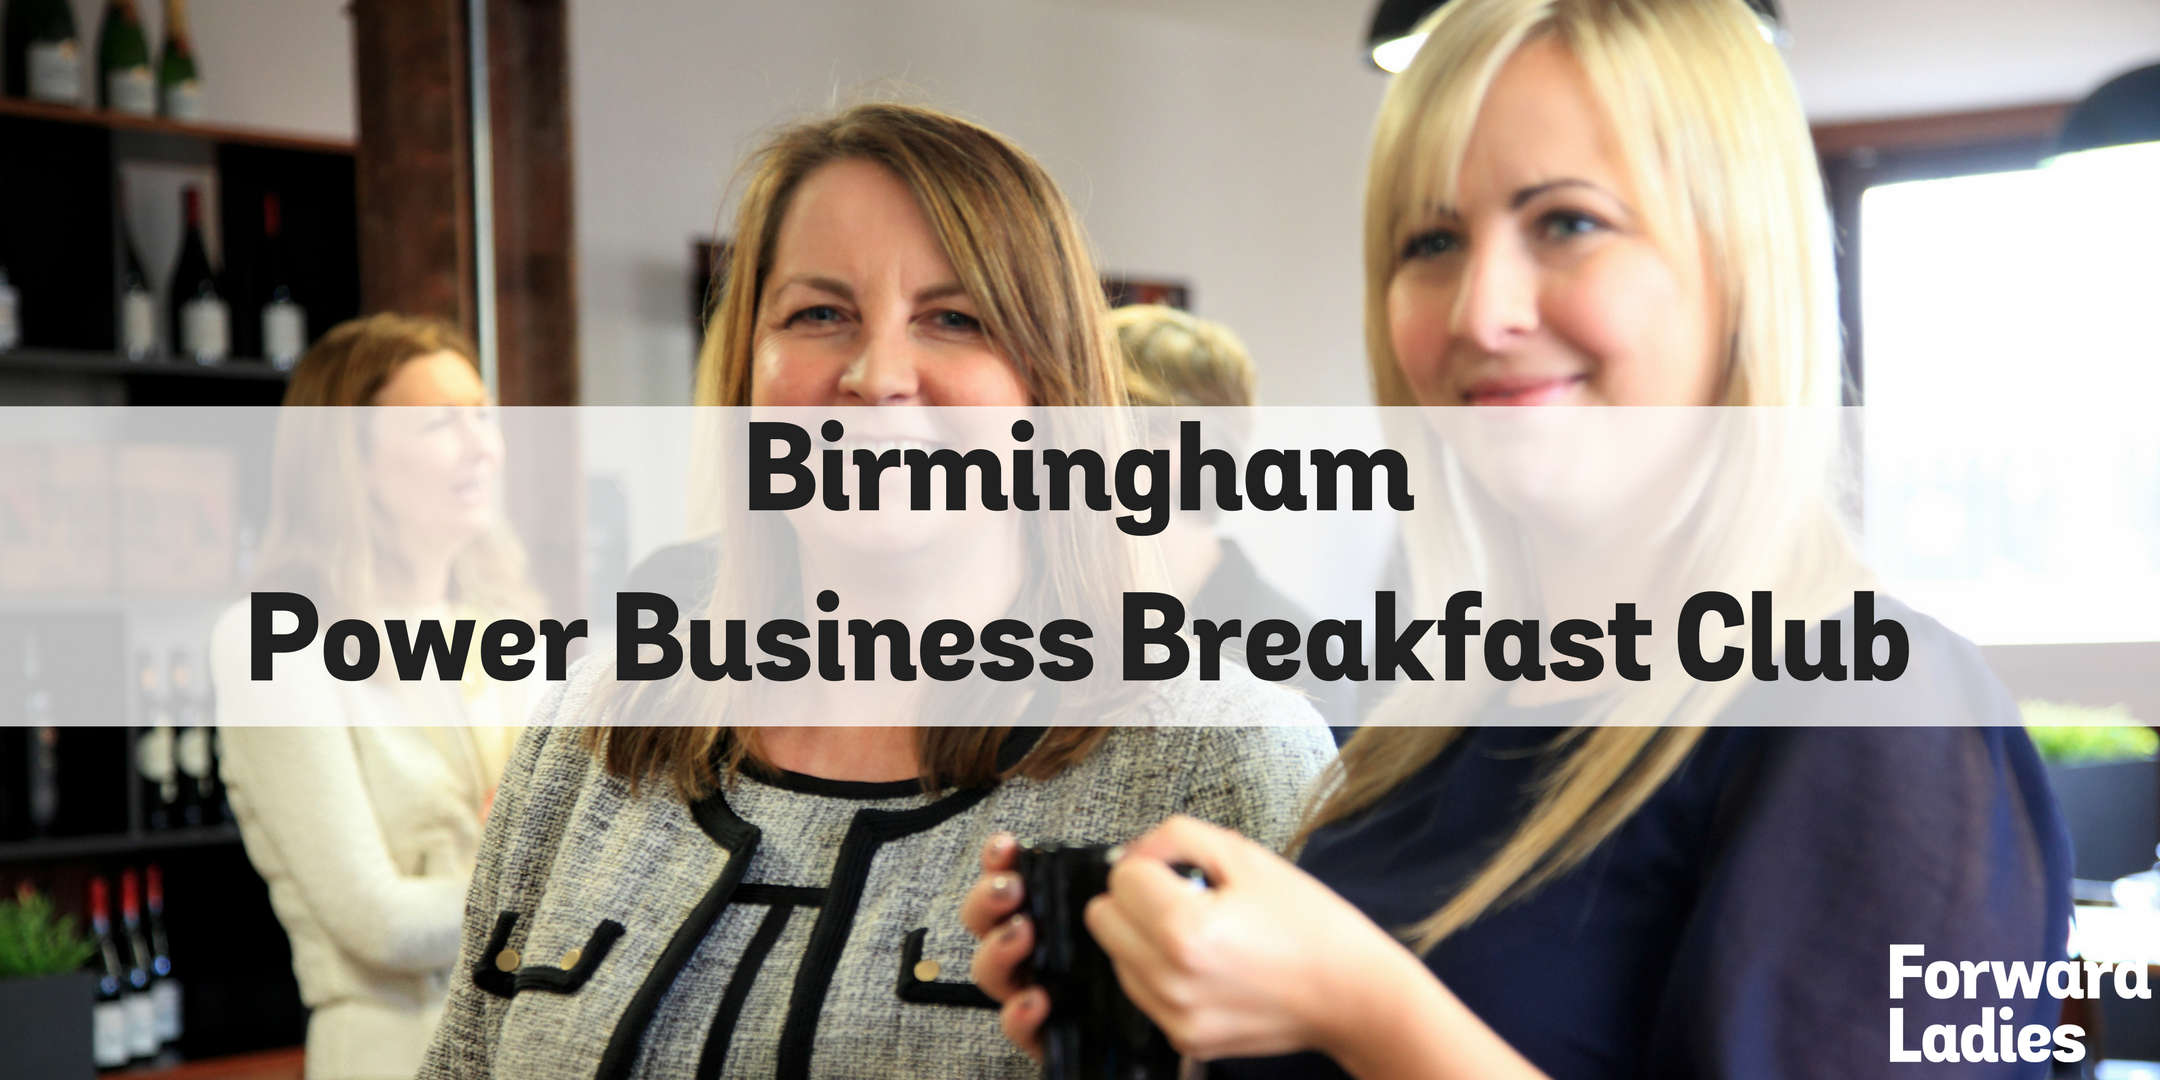 Birmingham Power Business Breakfast Club - Ju